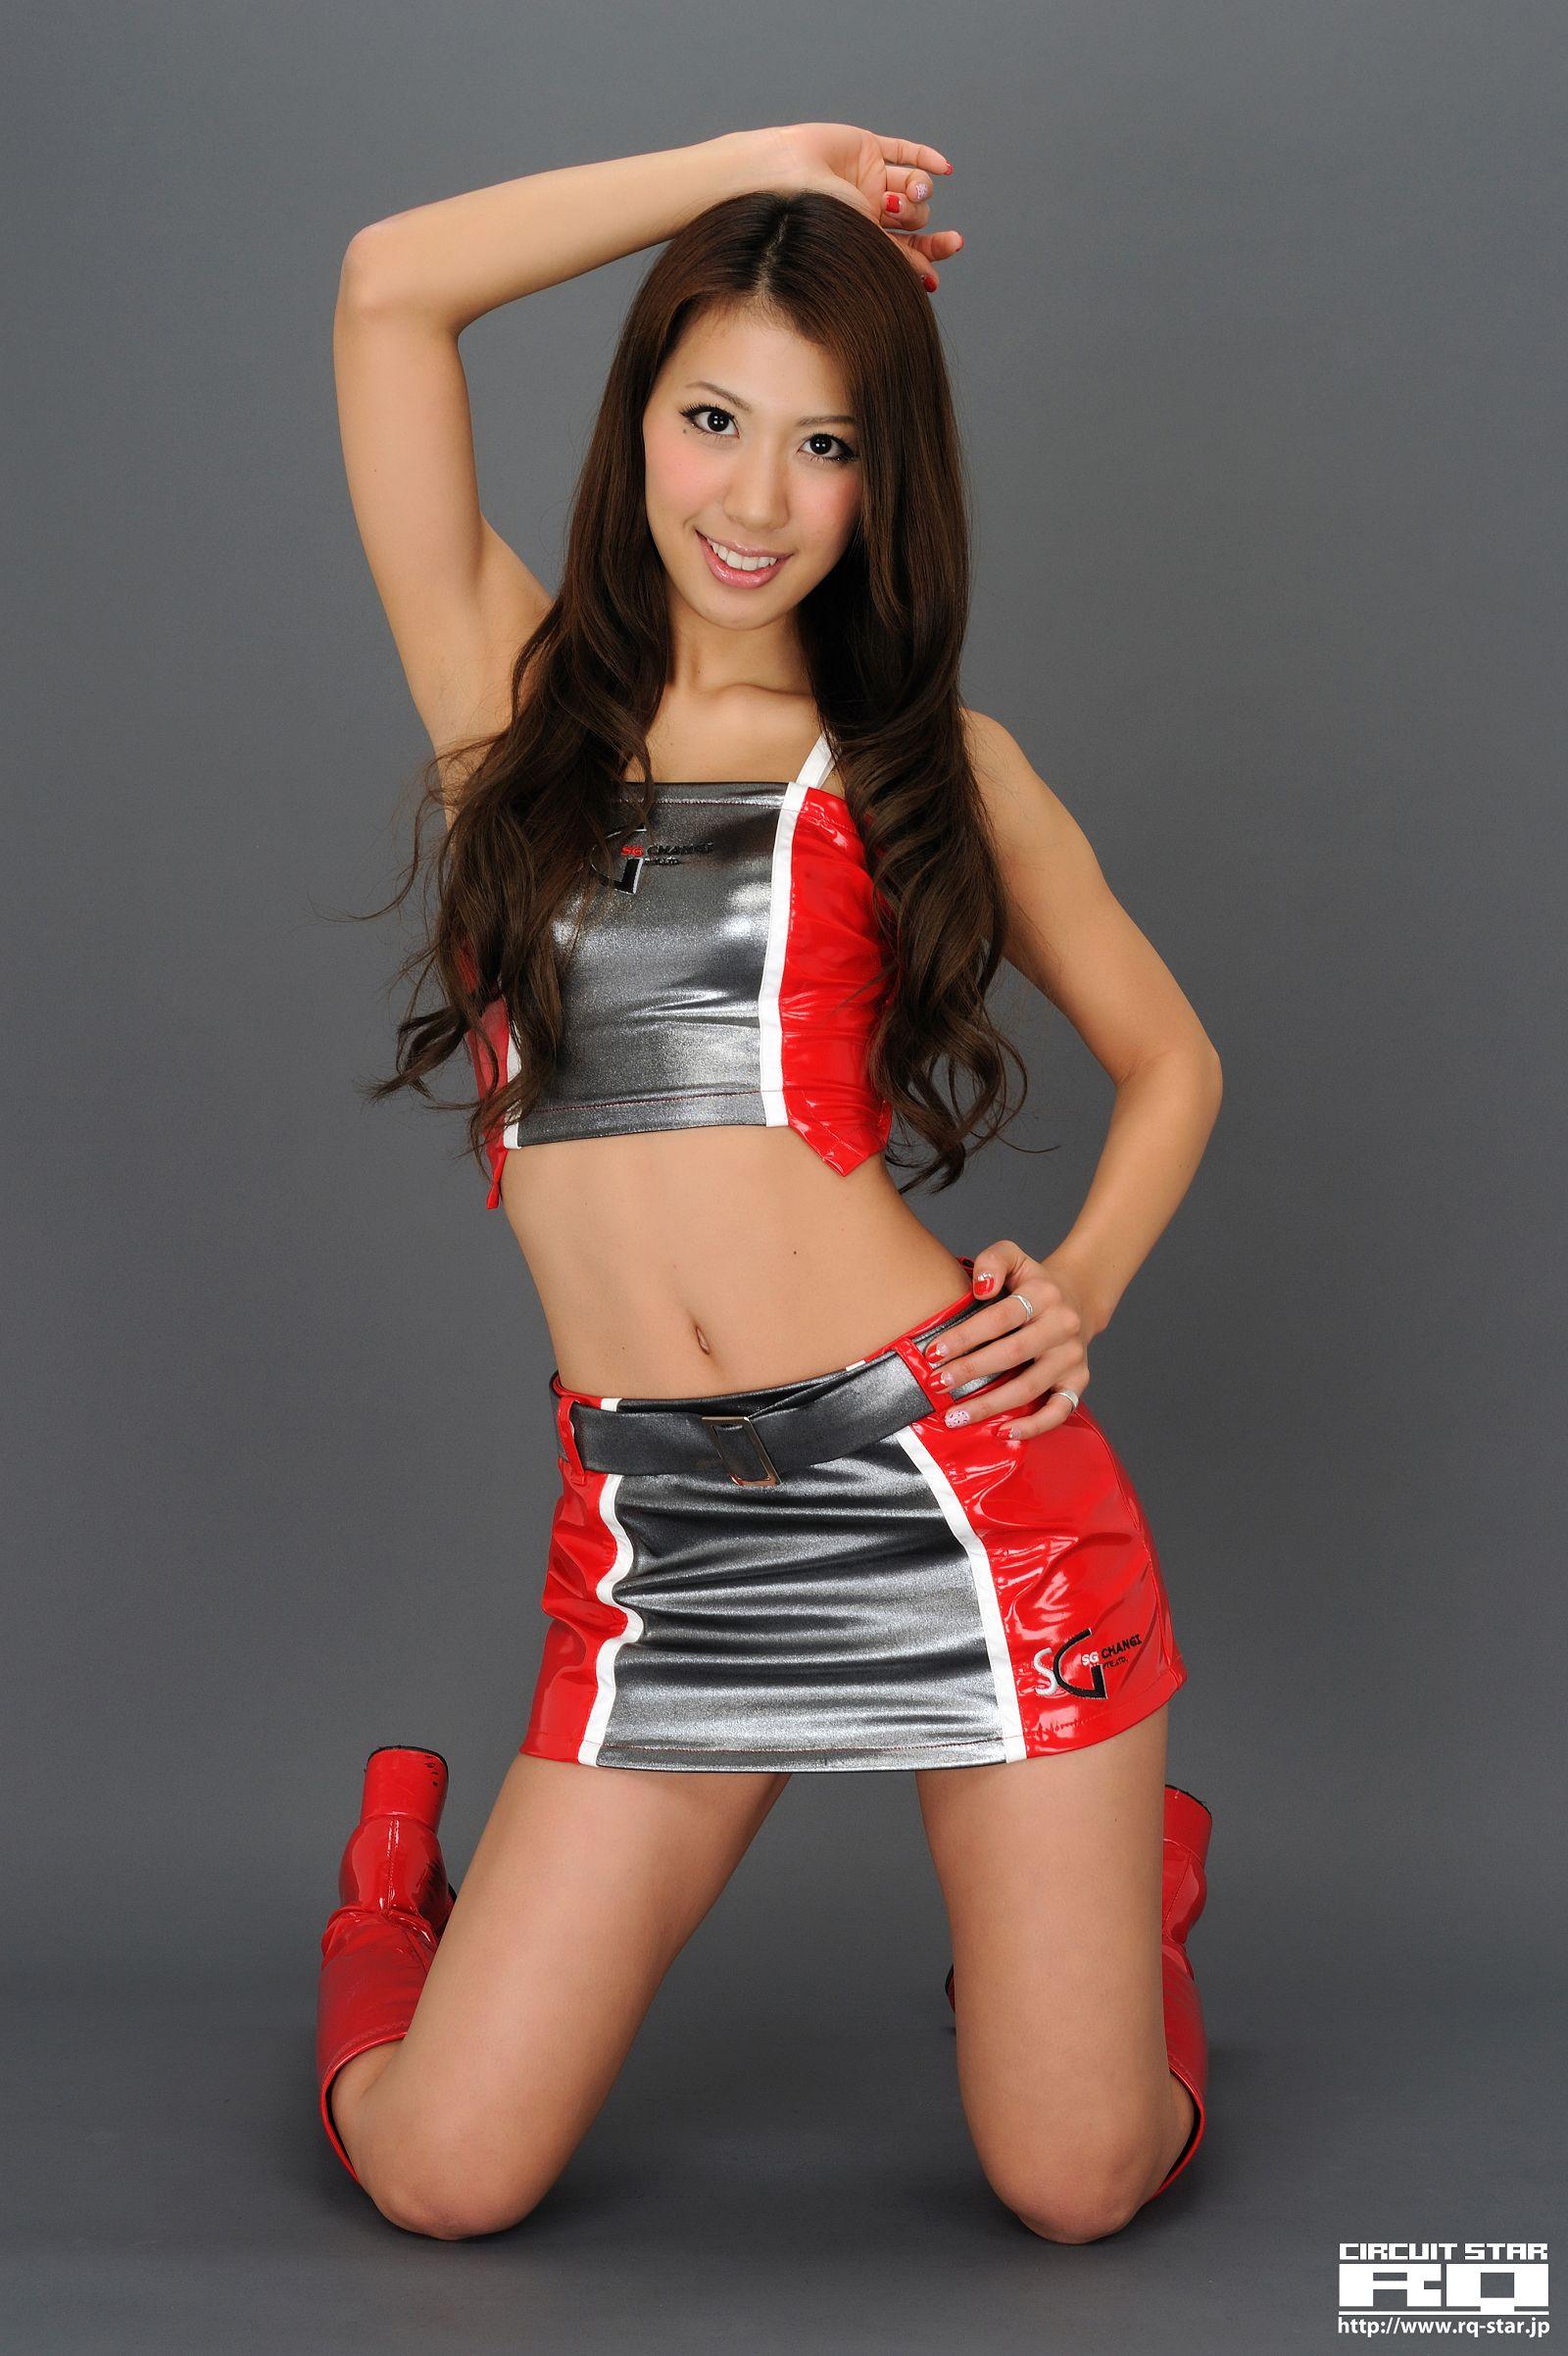 [RQ STAR美女] NO.00445 Rika Miki 三樹レイカ Race Queen[112P] RQ STAR 第3张